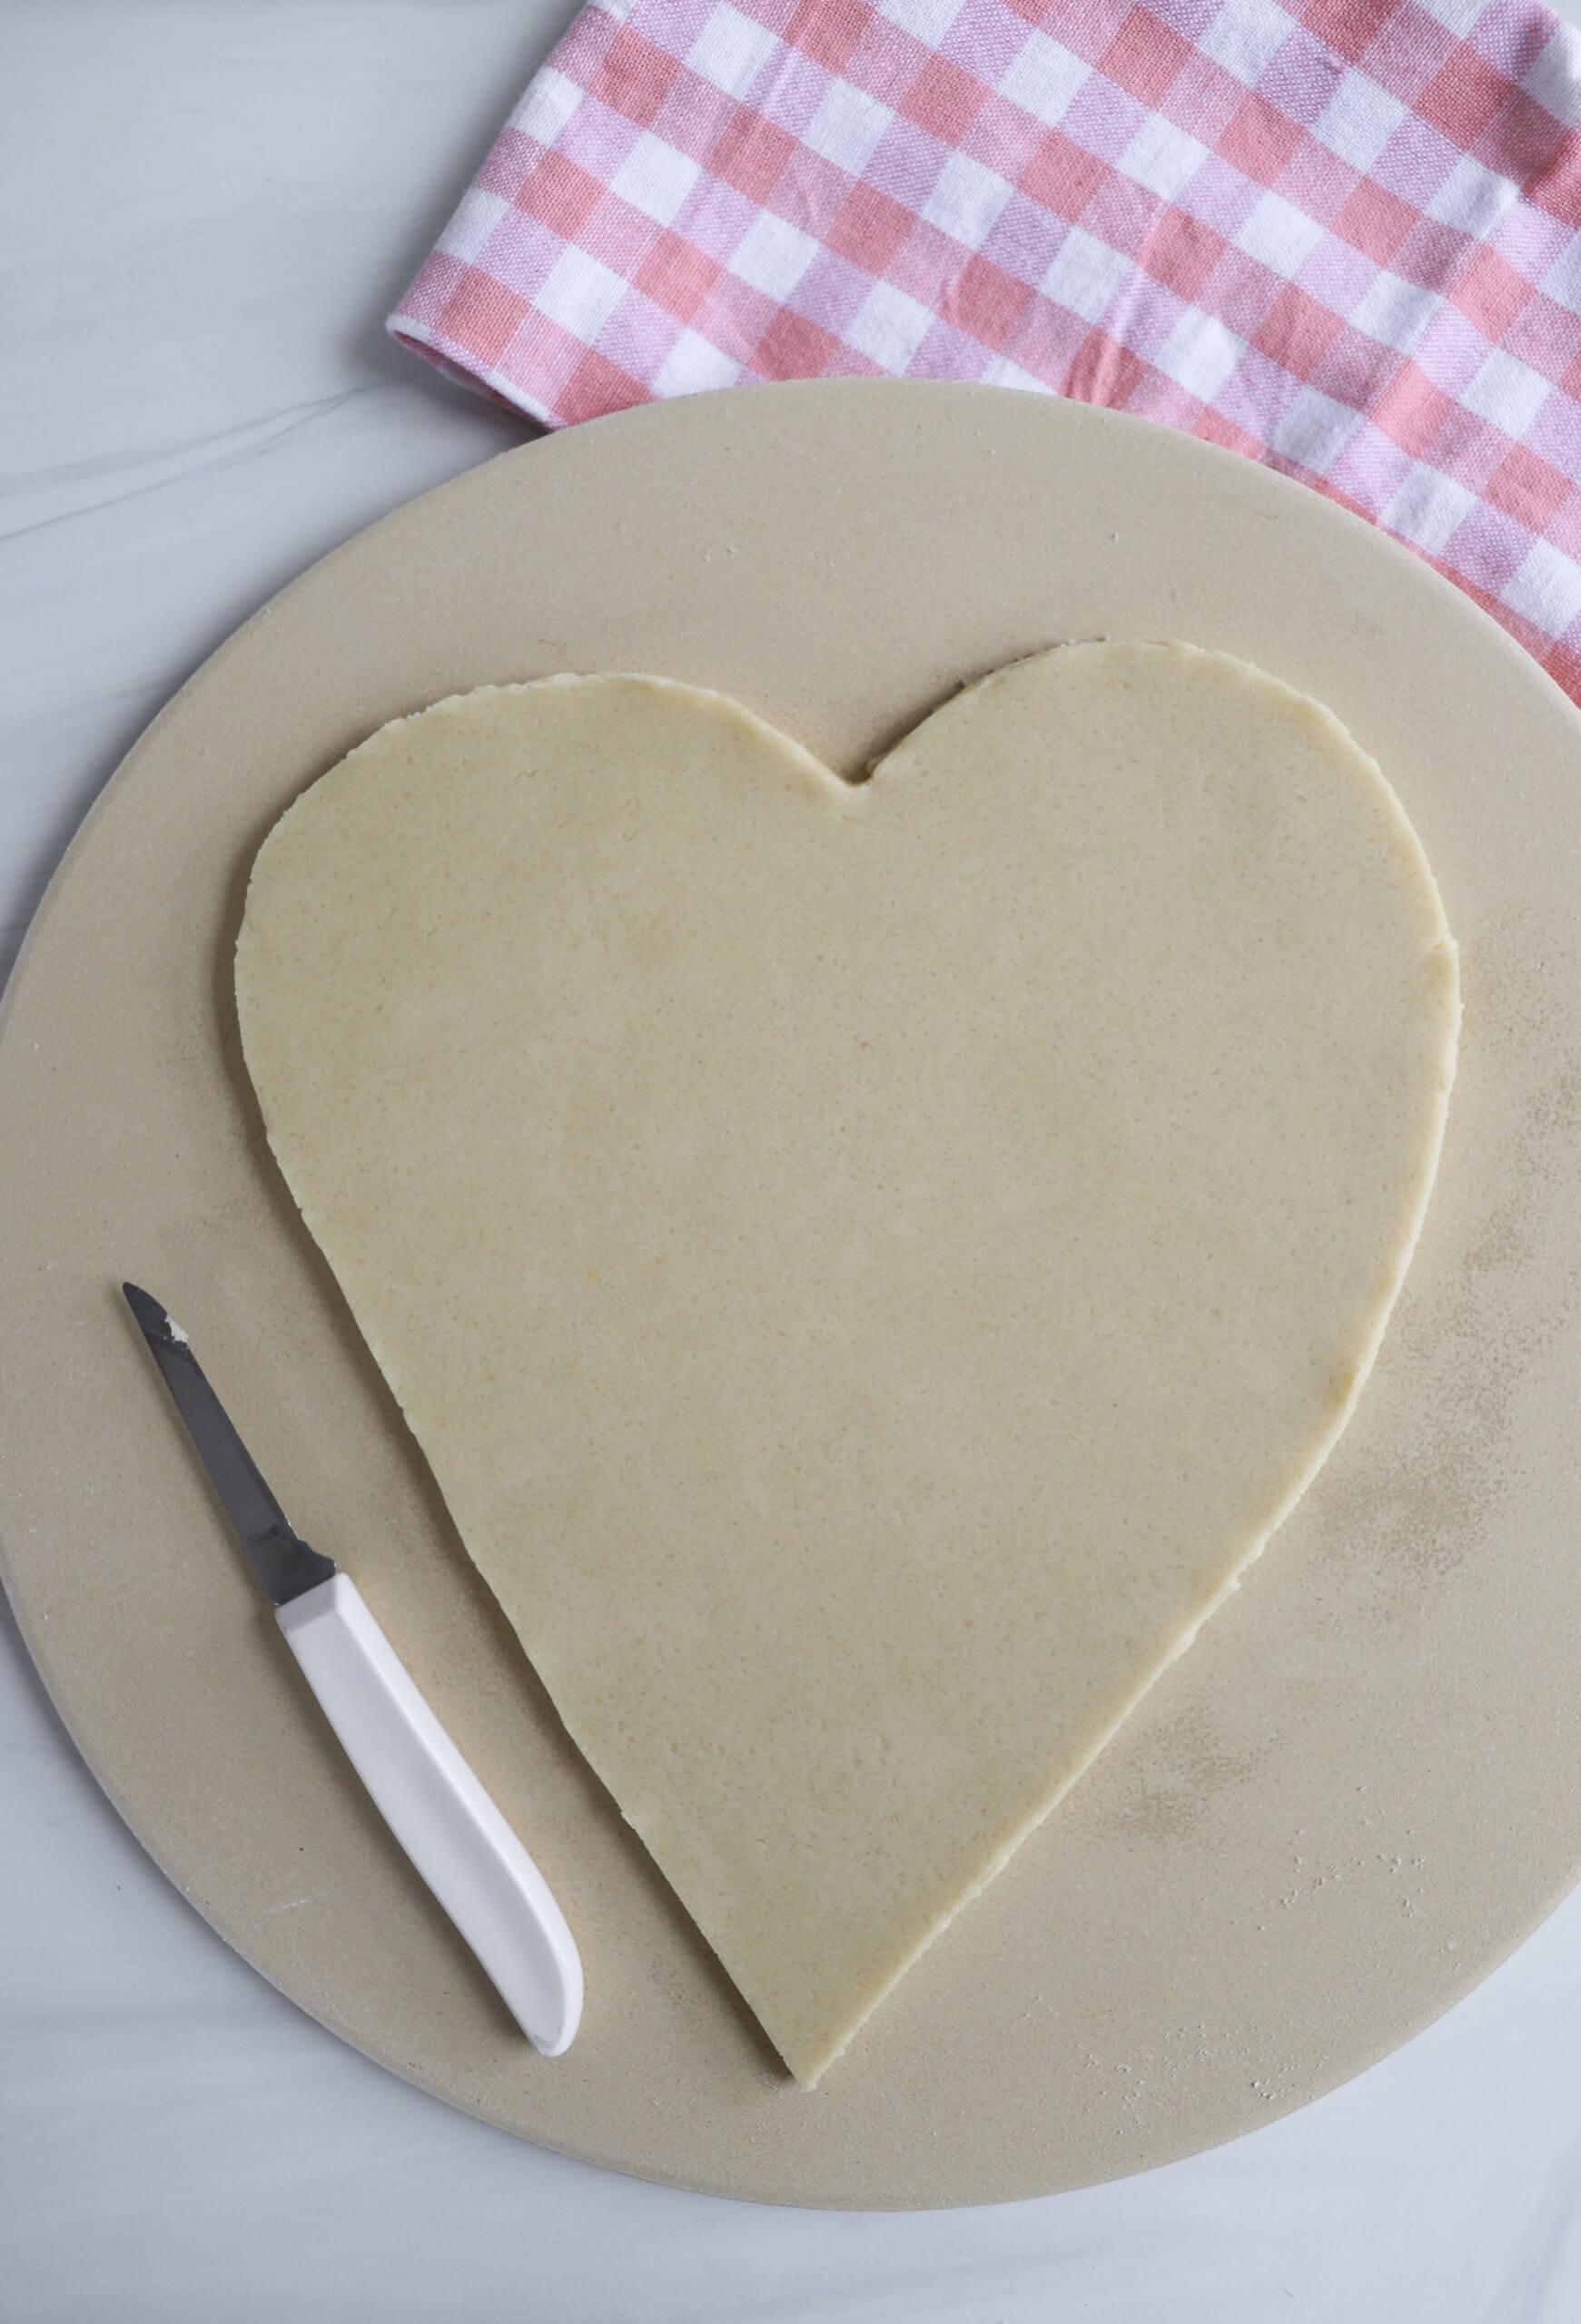 Making a heart-shaped pizza